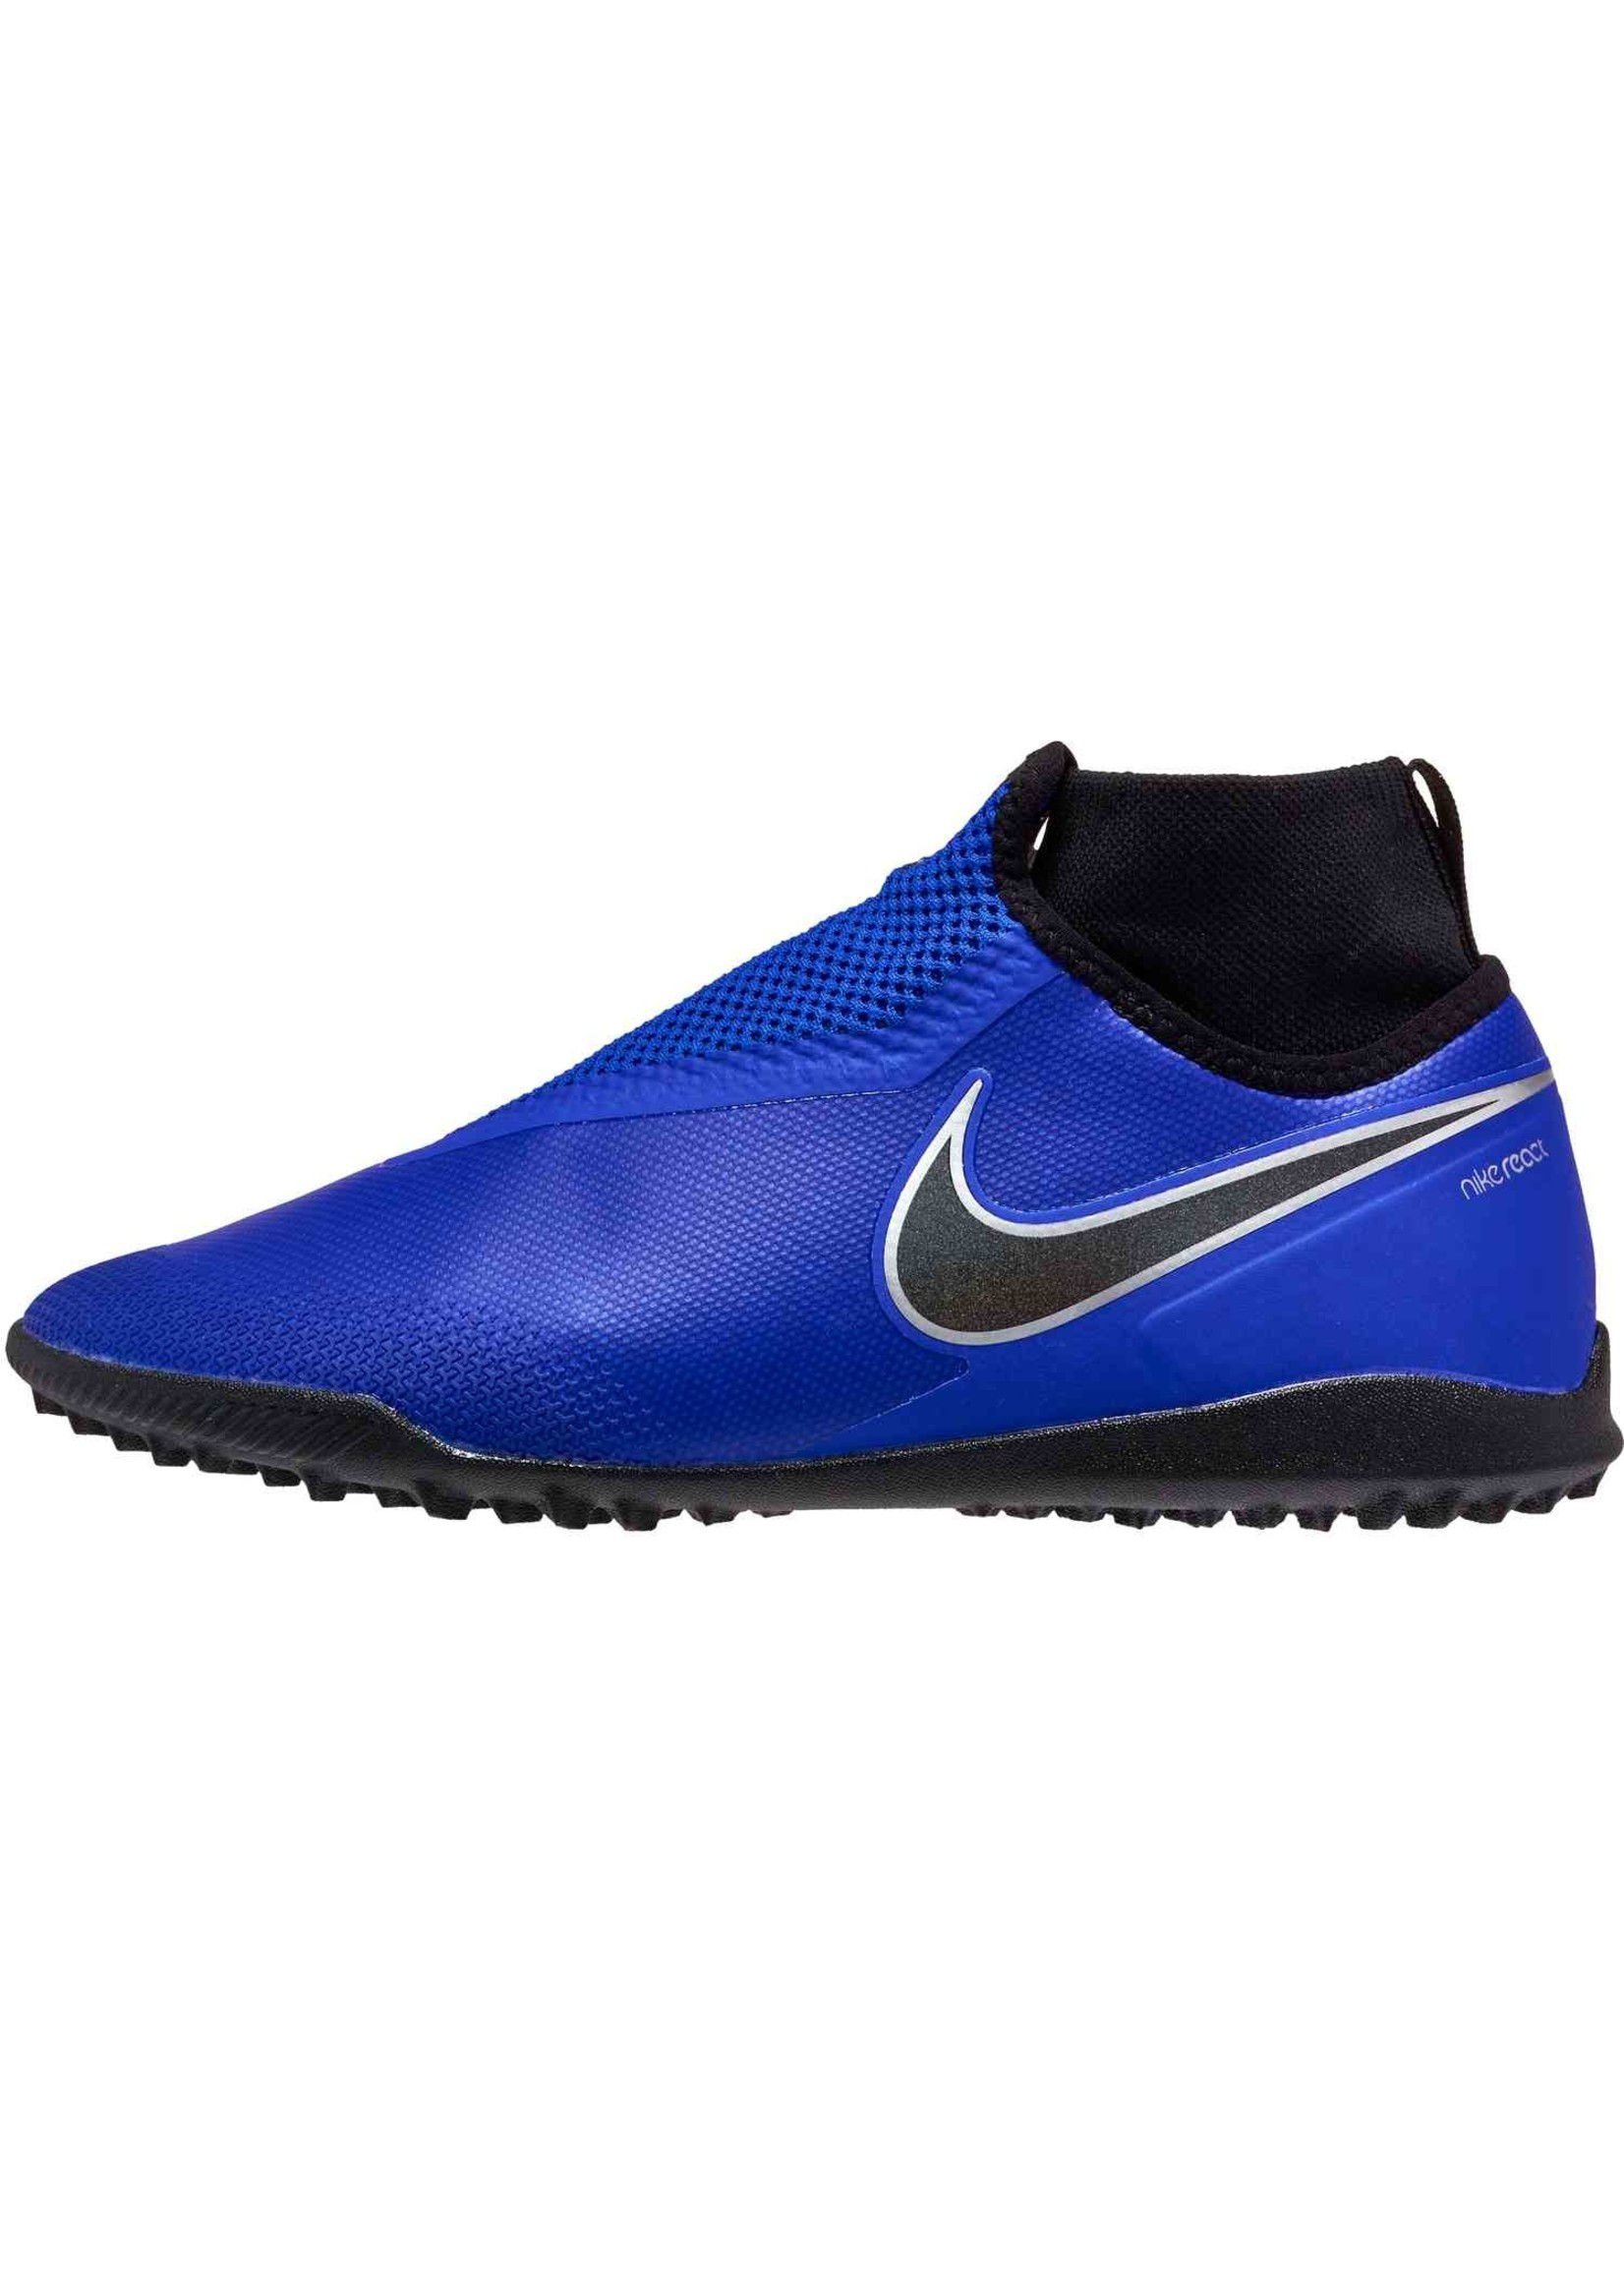 Nike React Phantom VSN Pro DF TF - Blue/Grey